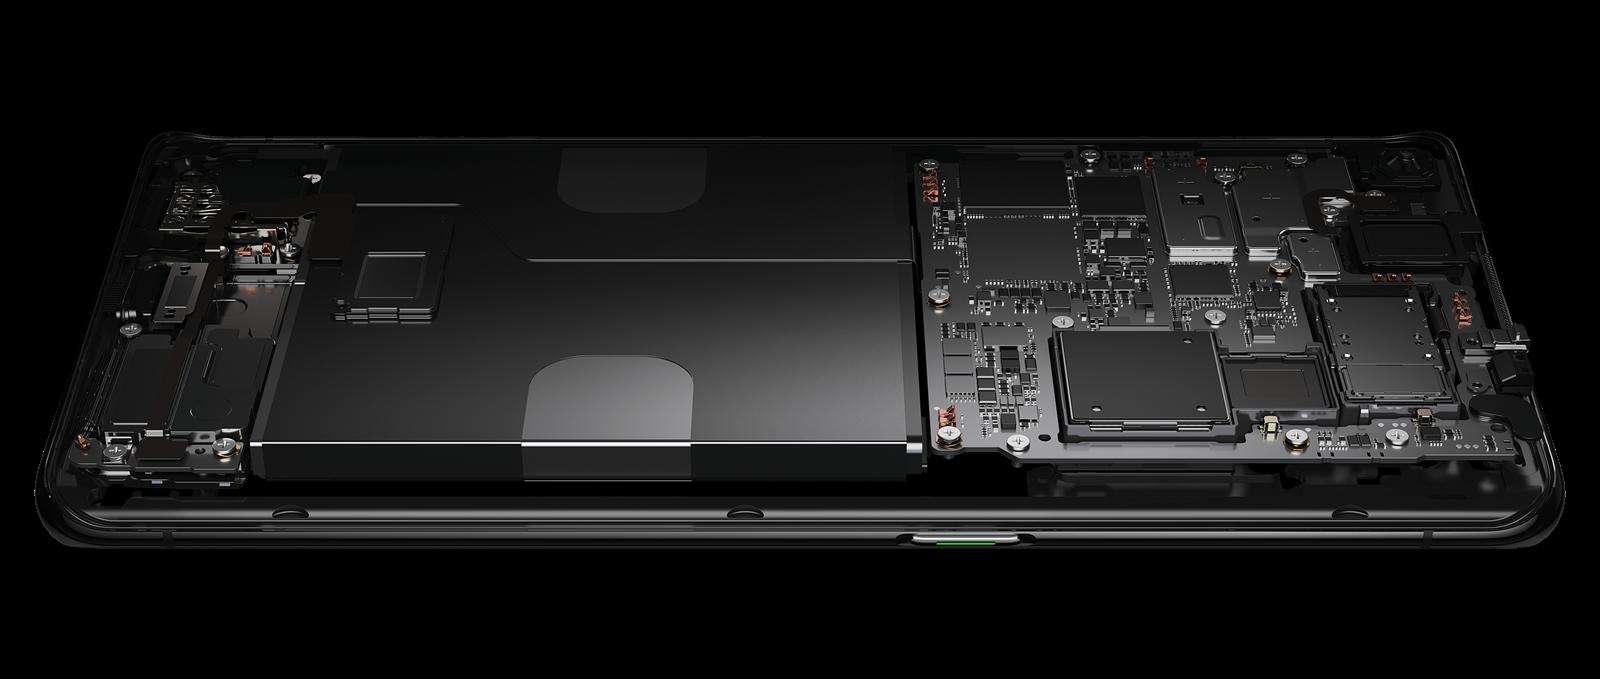 OPPO 正式發表 Find X2 系列!以 120Hz 螢幕刷新率、QHD+ 解析度超感螢幕與卓越性能成就全方位 5G 旗艦 @3C 達人廖阿輝